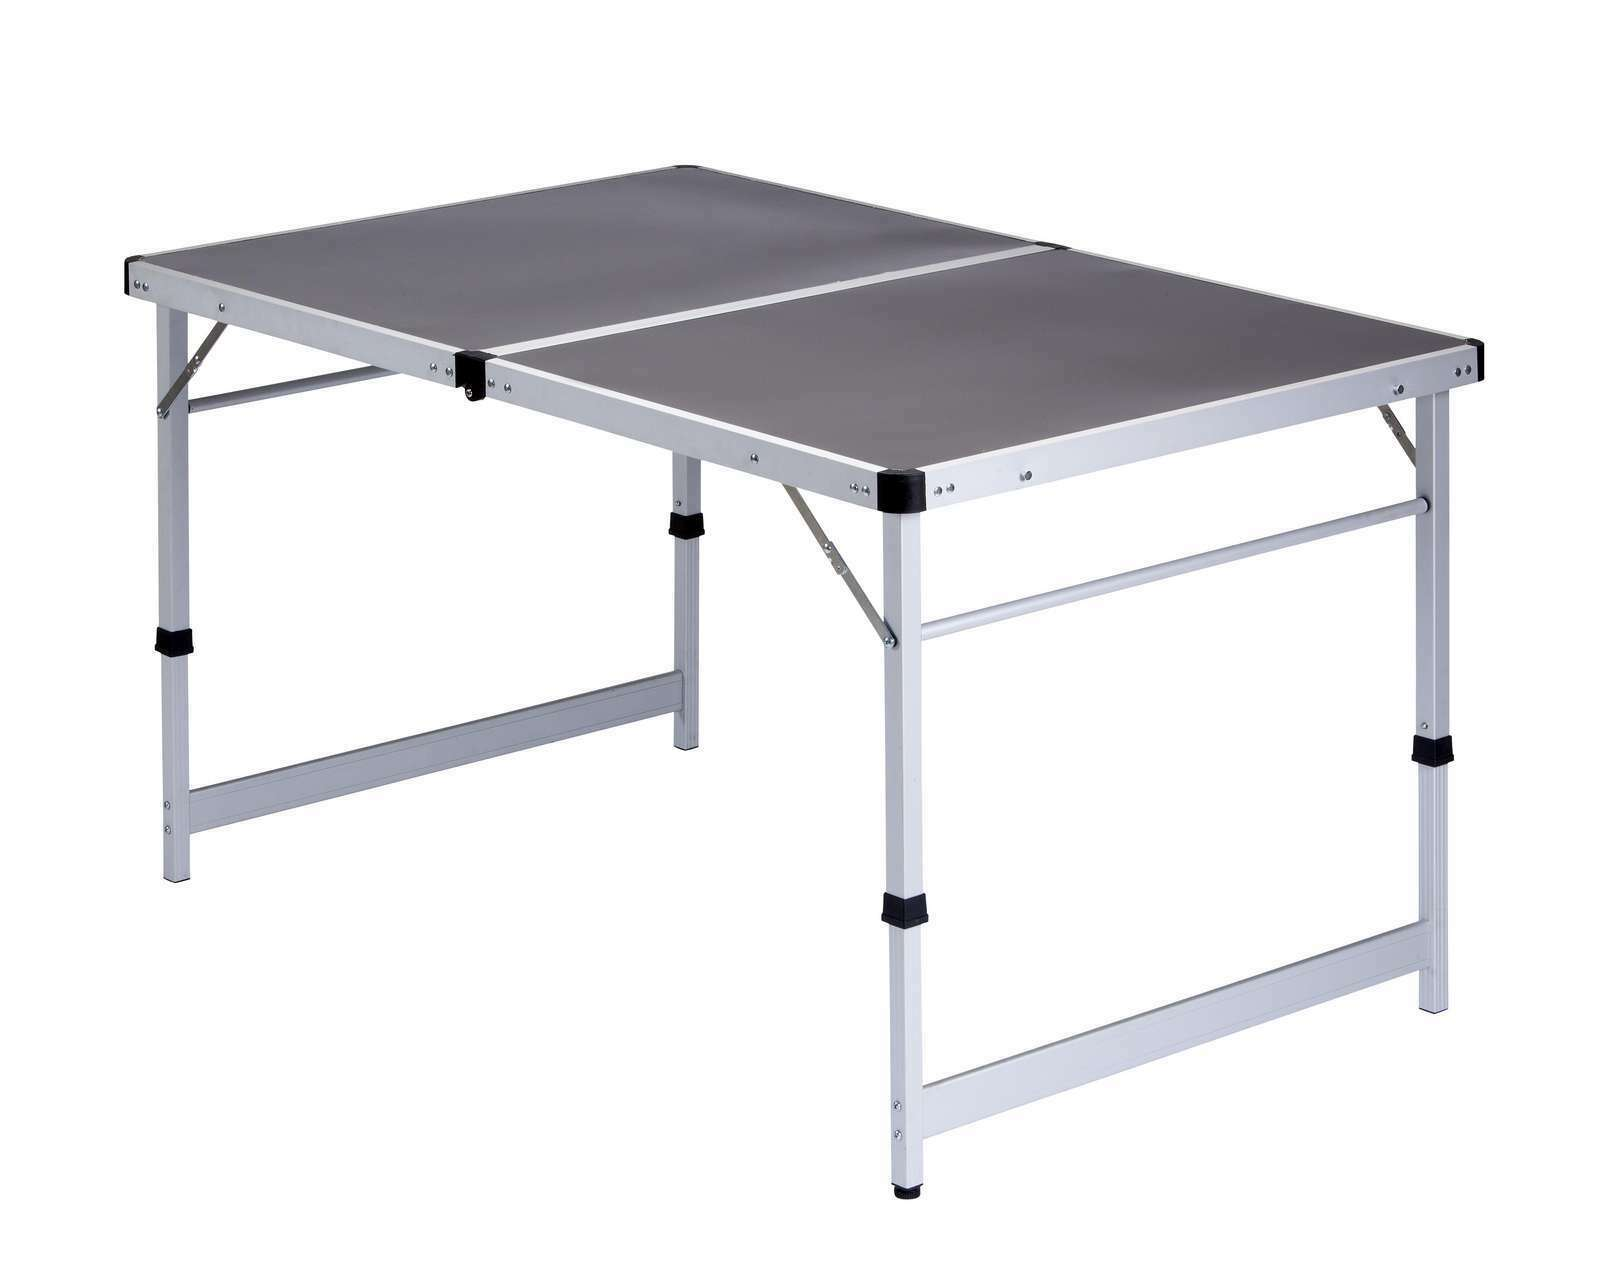 Isabella Table, Isabella Isabella Table, Furniture, Camping Tables, Caravan Accessory fdea66